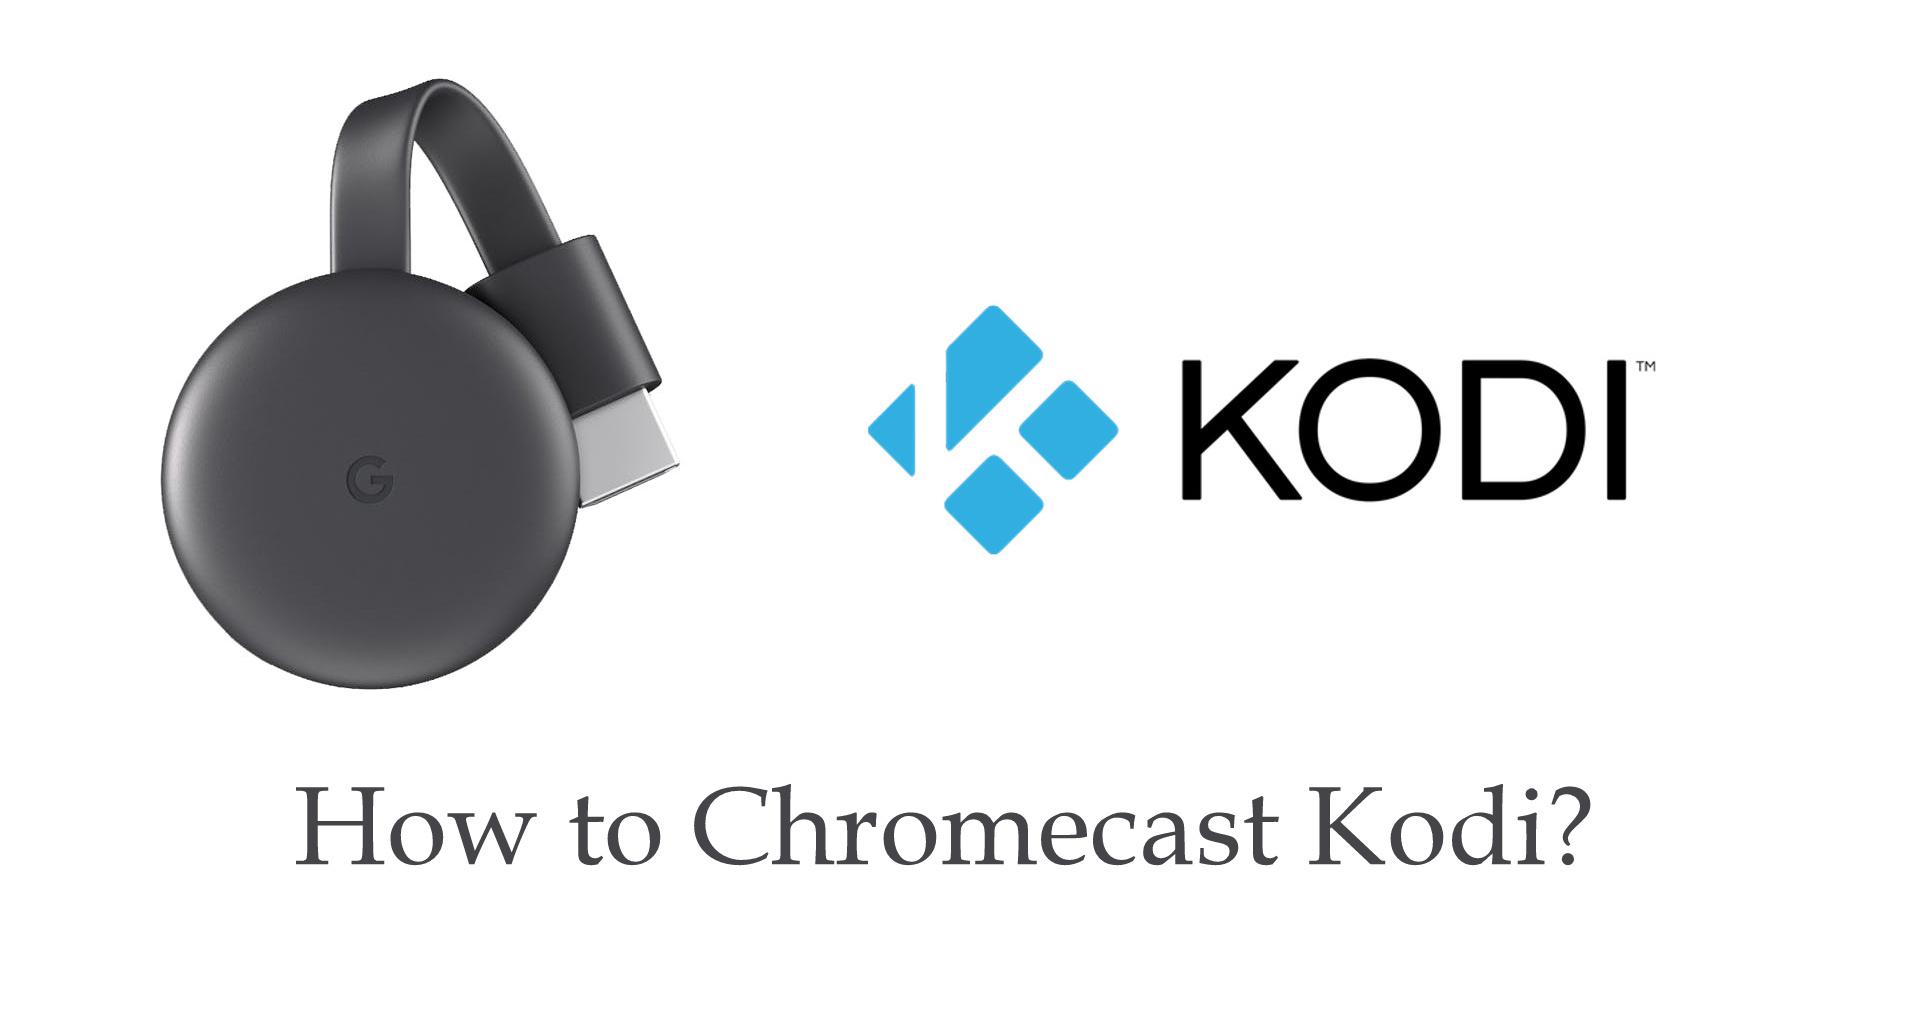 How Can We Install Kodi On Google Chromecast?